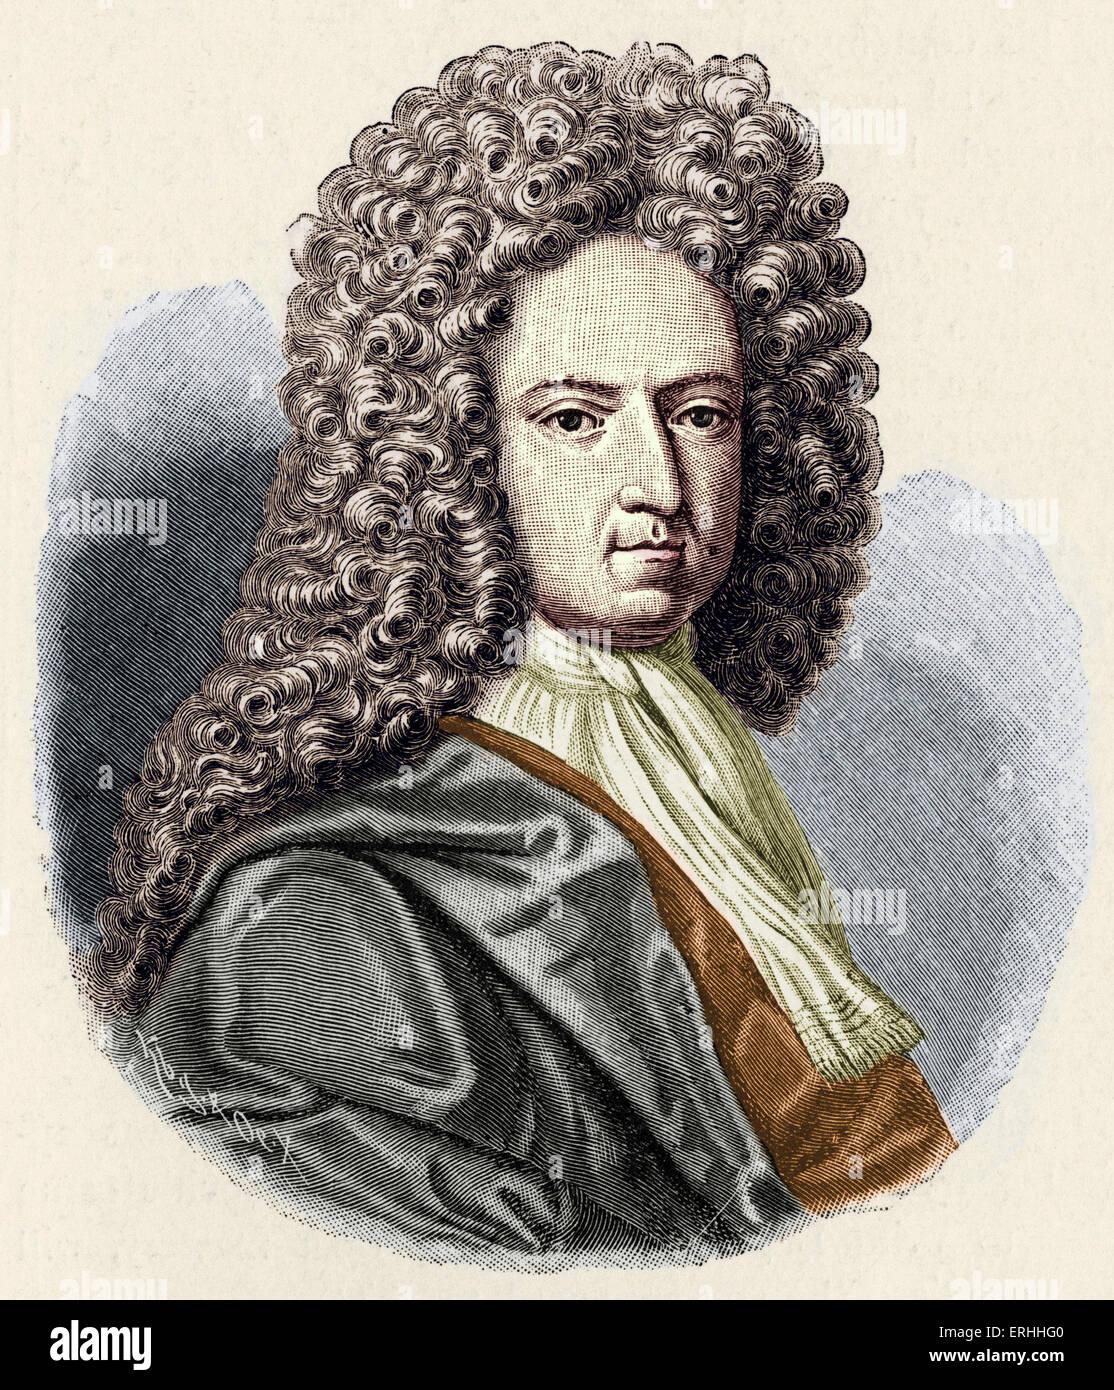 Daniel Defoe - portrait. English author and journalist 1660-1731. Colourised - Stock Image